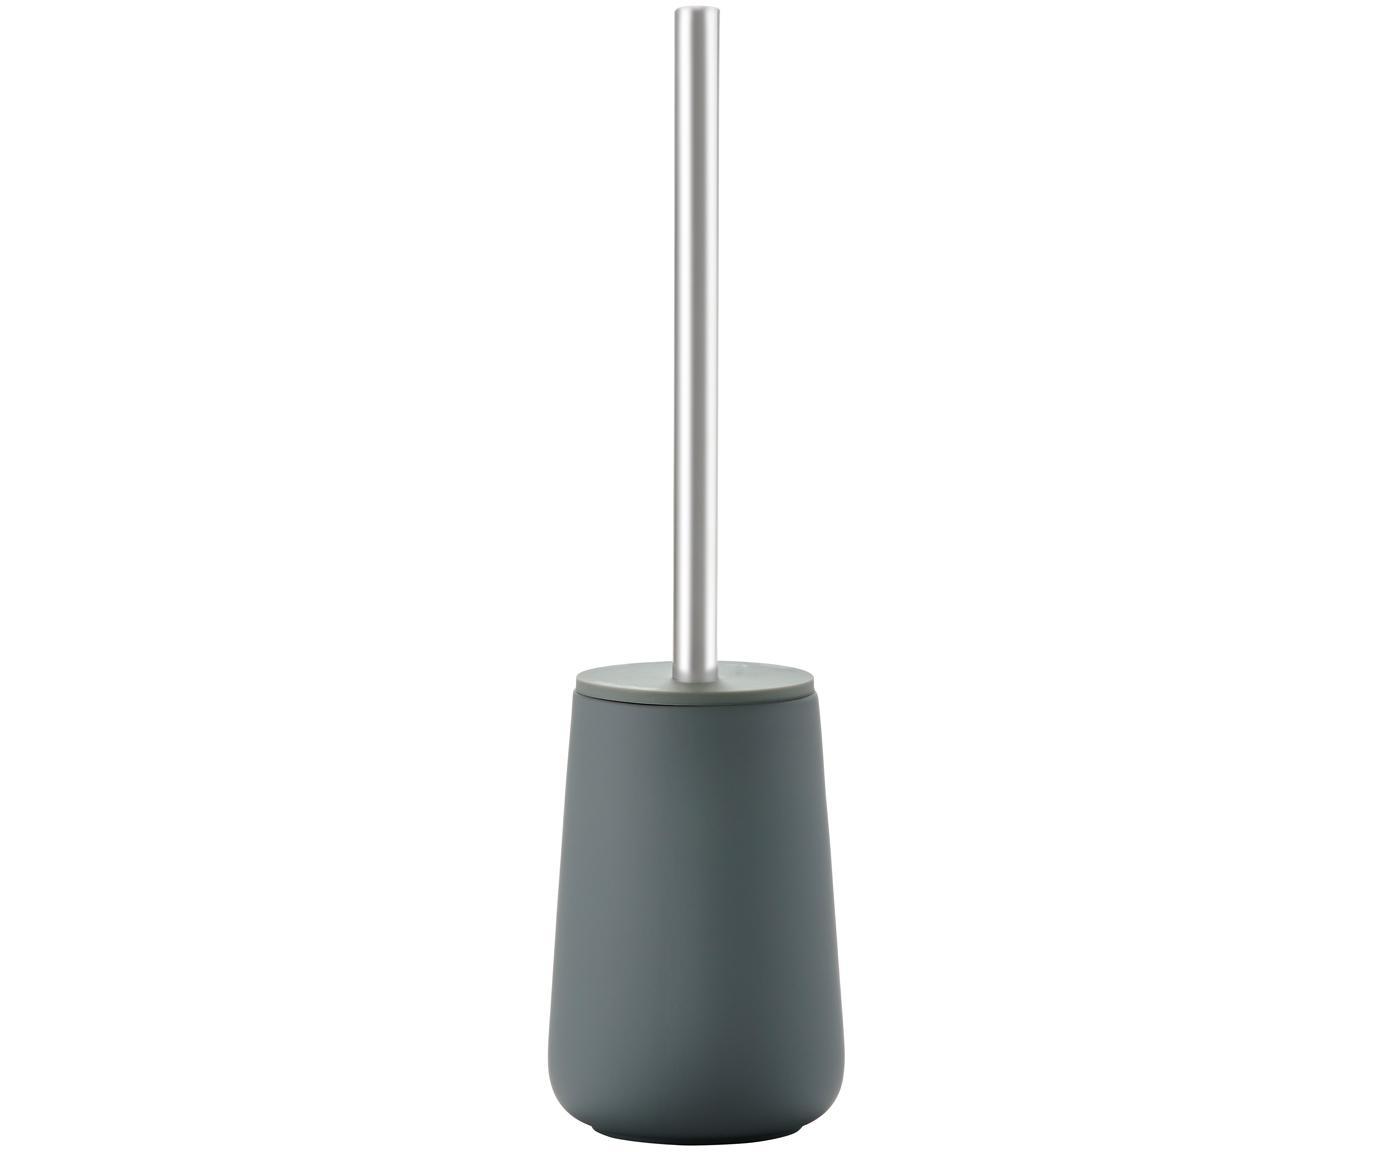 Toilettenbürste Nova mit Porzellan-Behälter, Behälter: Porzellan, Griff: Edelstahl, Grau matt, Edelstahl, Ø 10 x H 43 cm